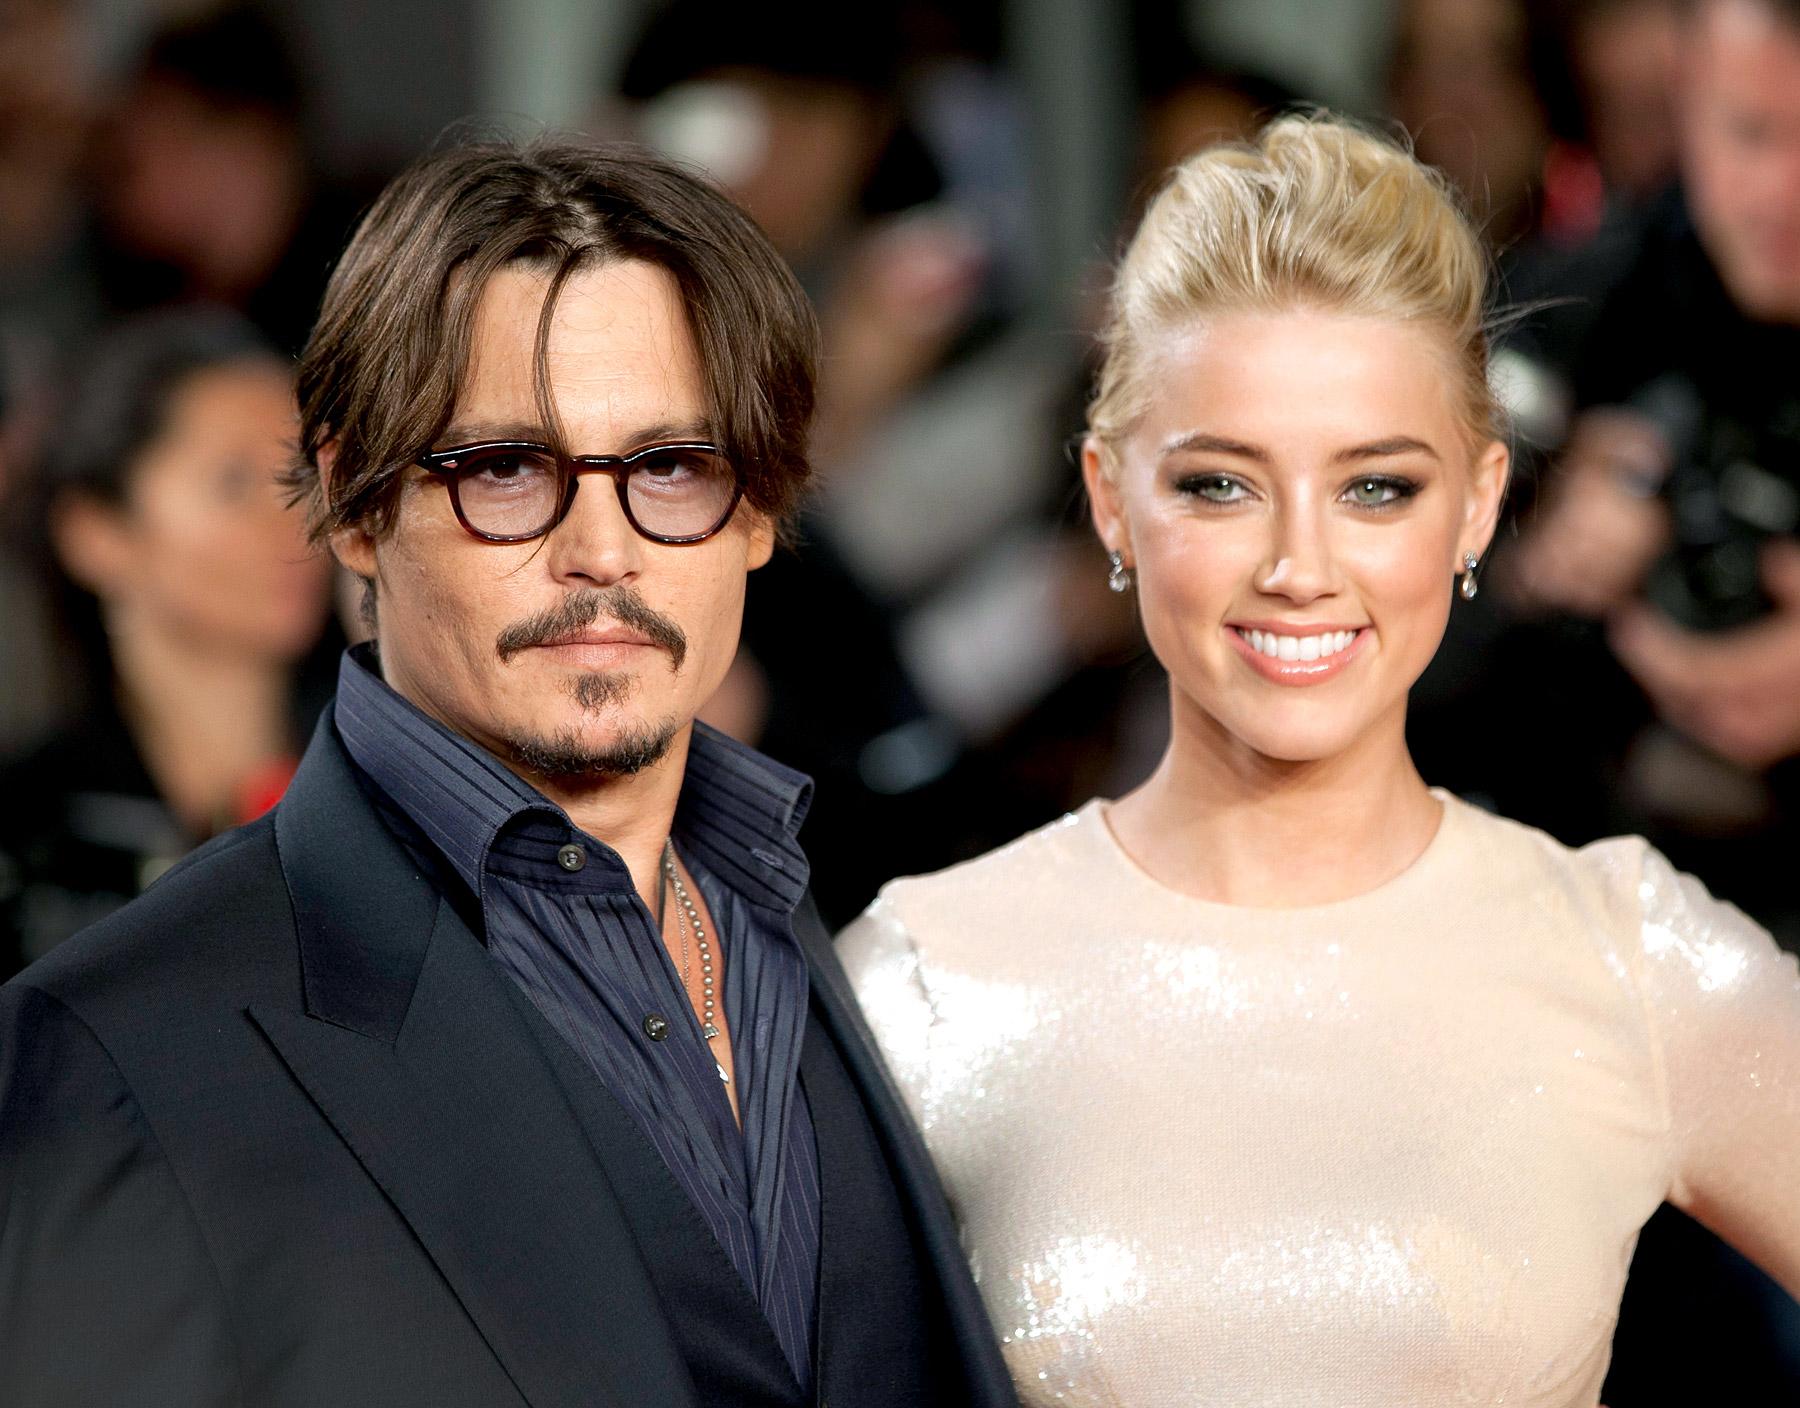 Johnny-Depp-se-va-c%C4%83s%C4%83tori-%C3%AEn-noaptea-de-Revelion